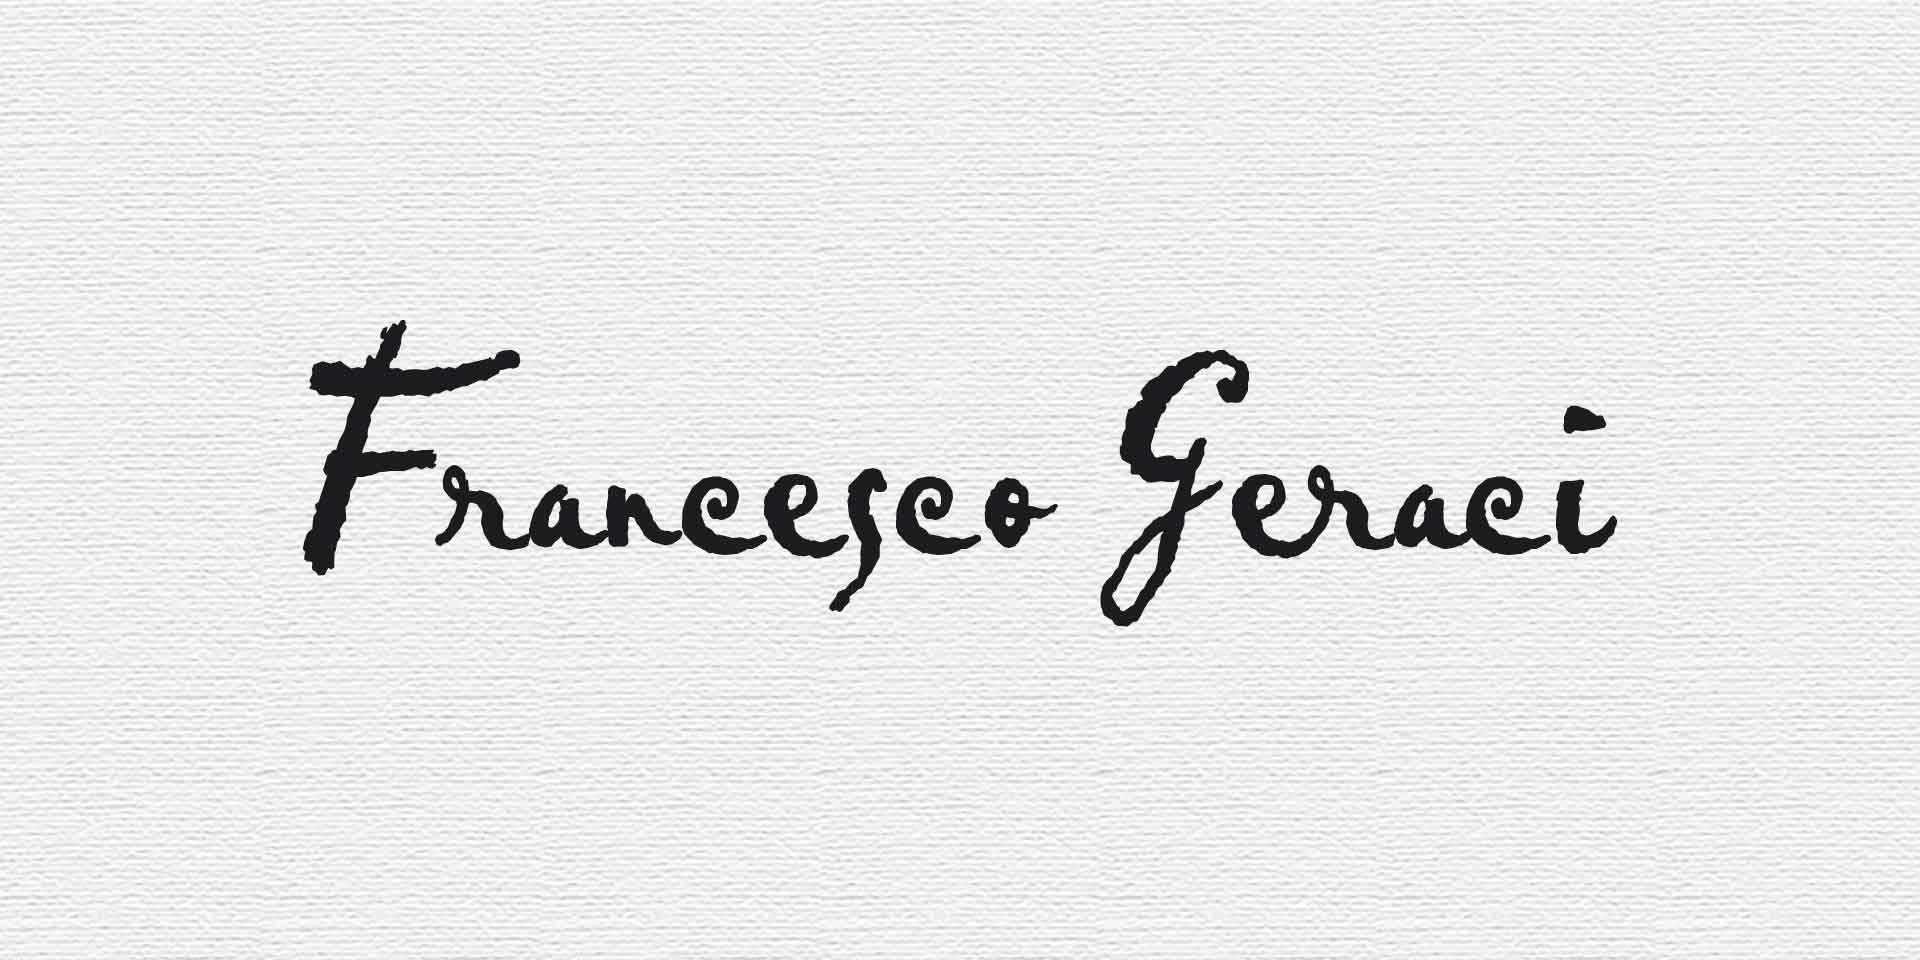 Francesco Geraci